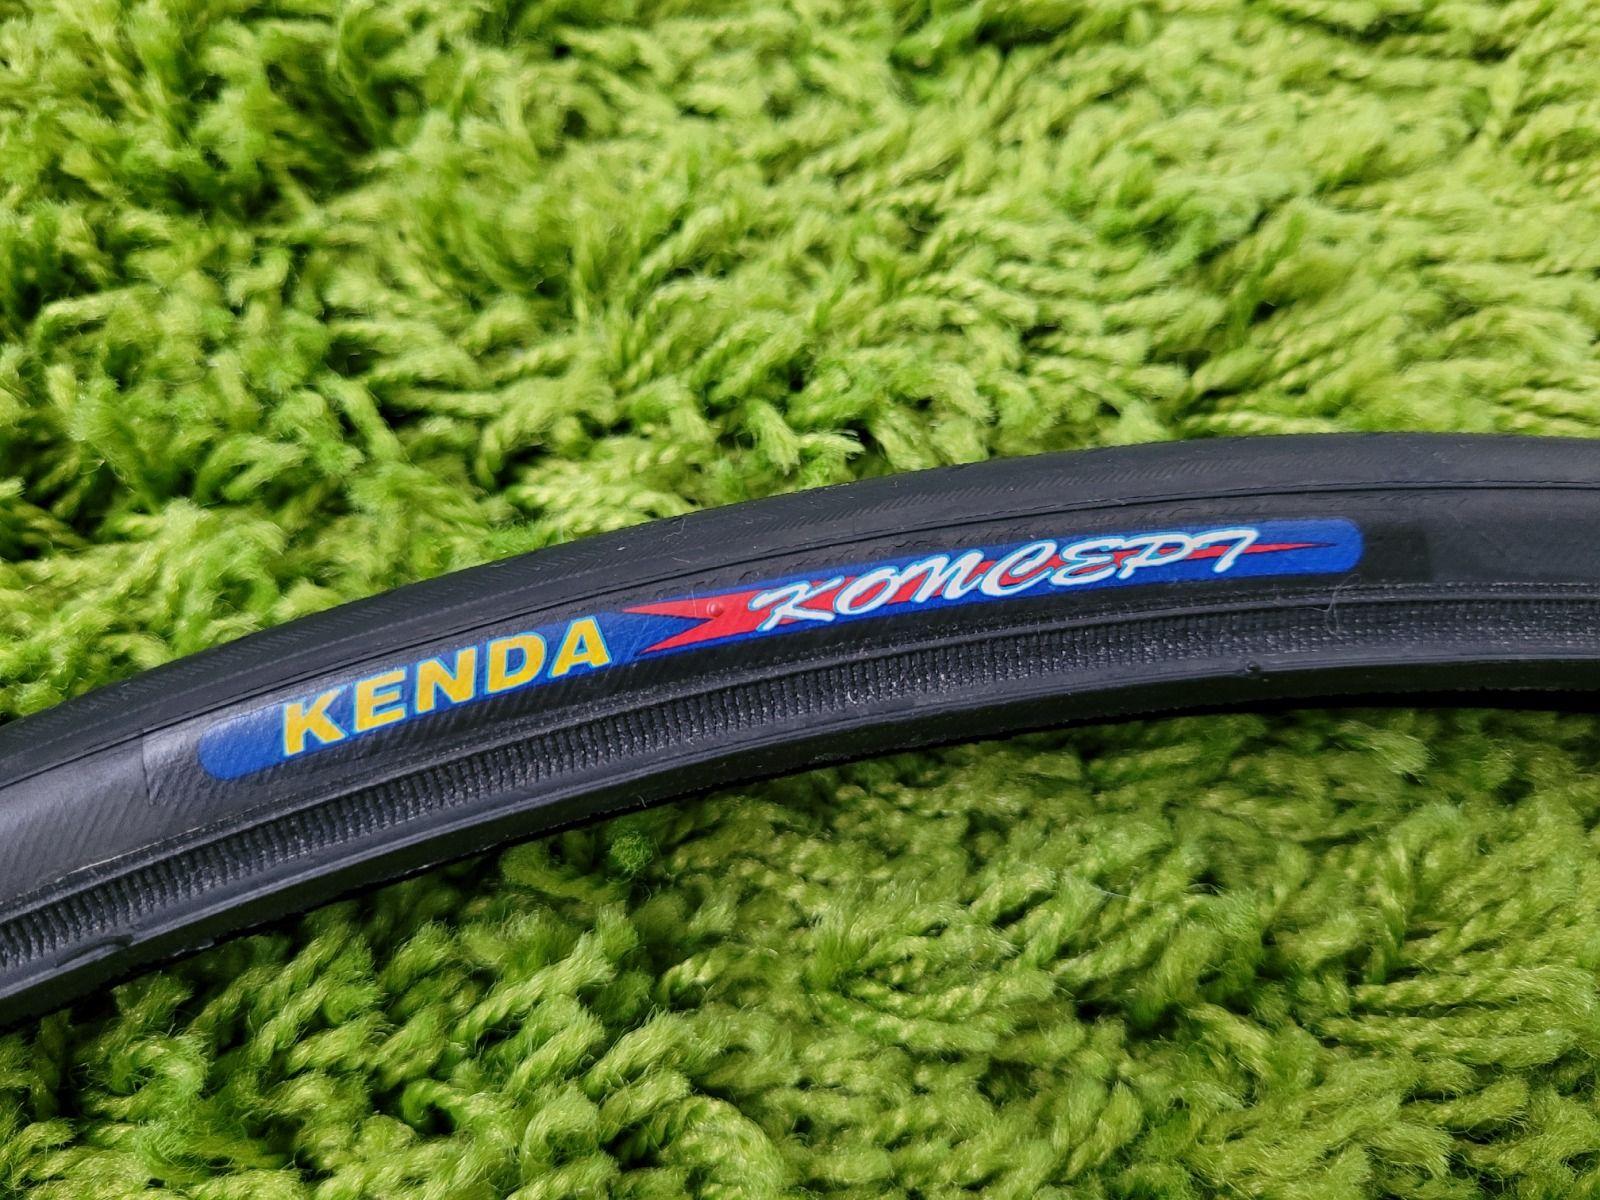 Покрышка Kenda Koncept 700x23c